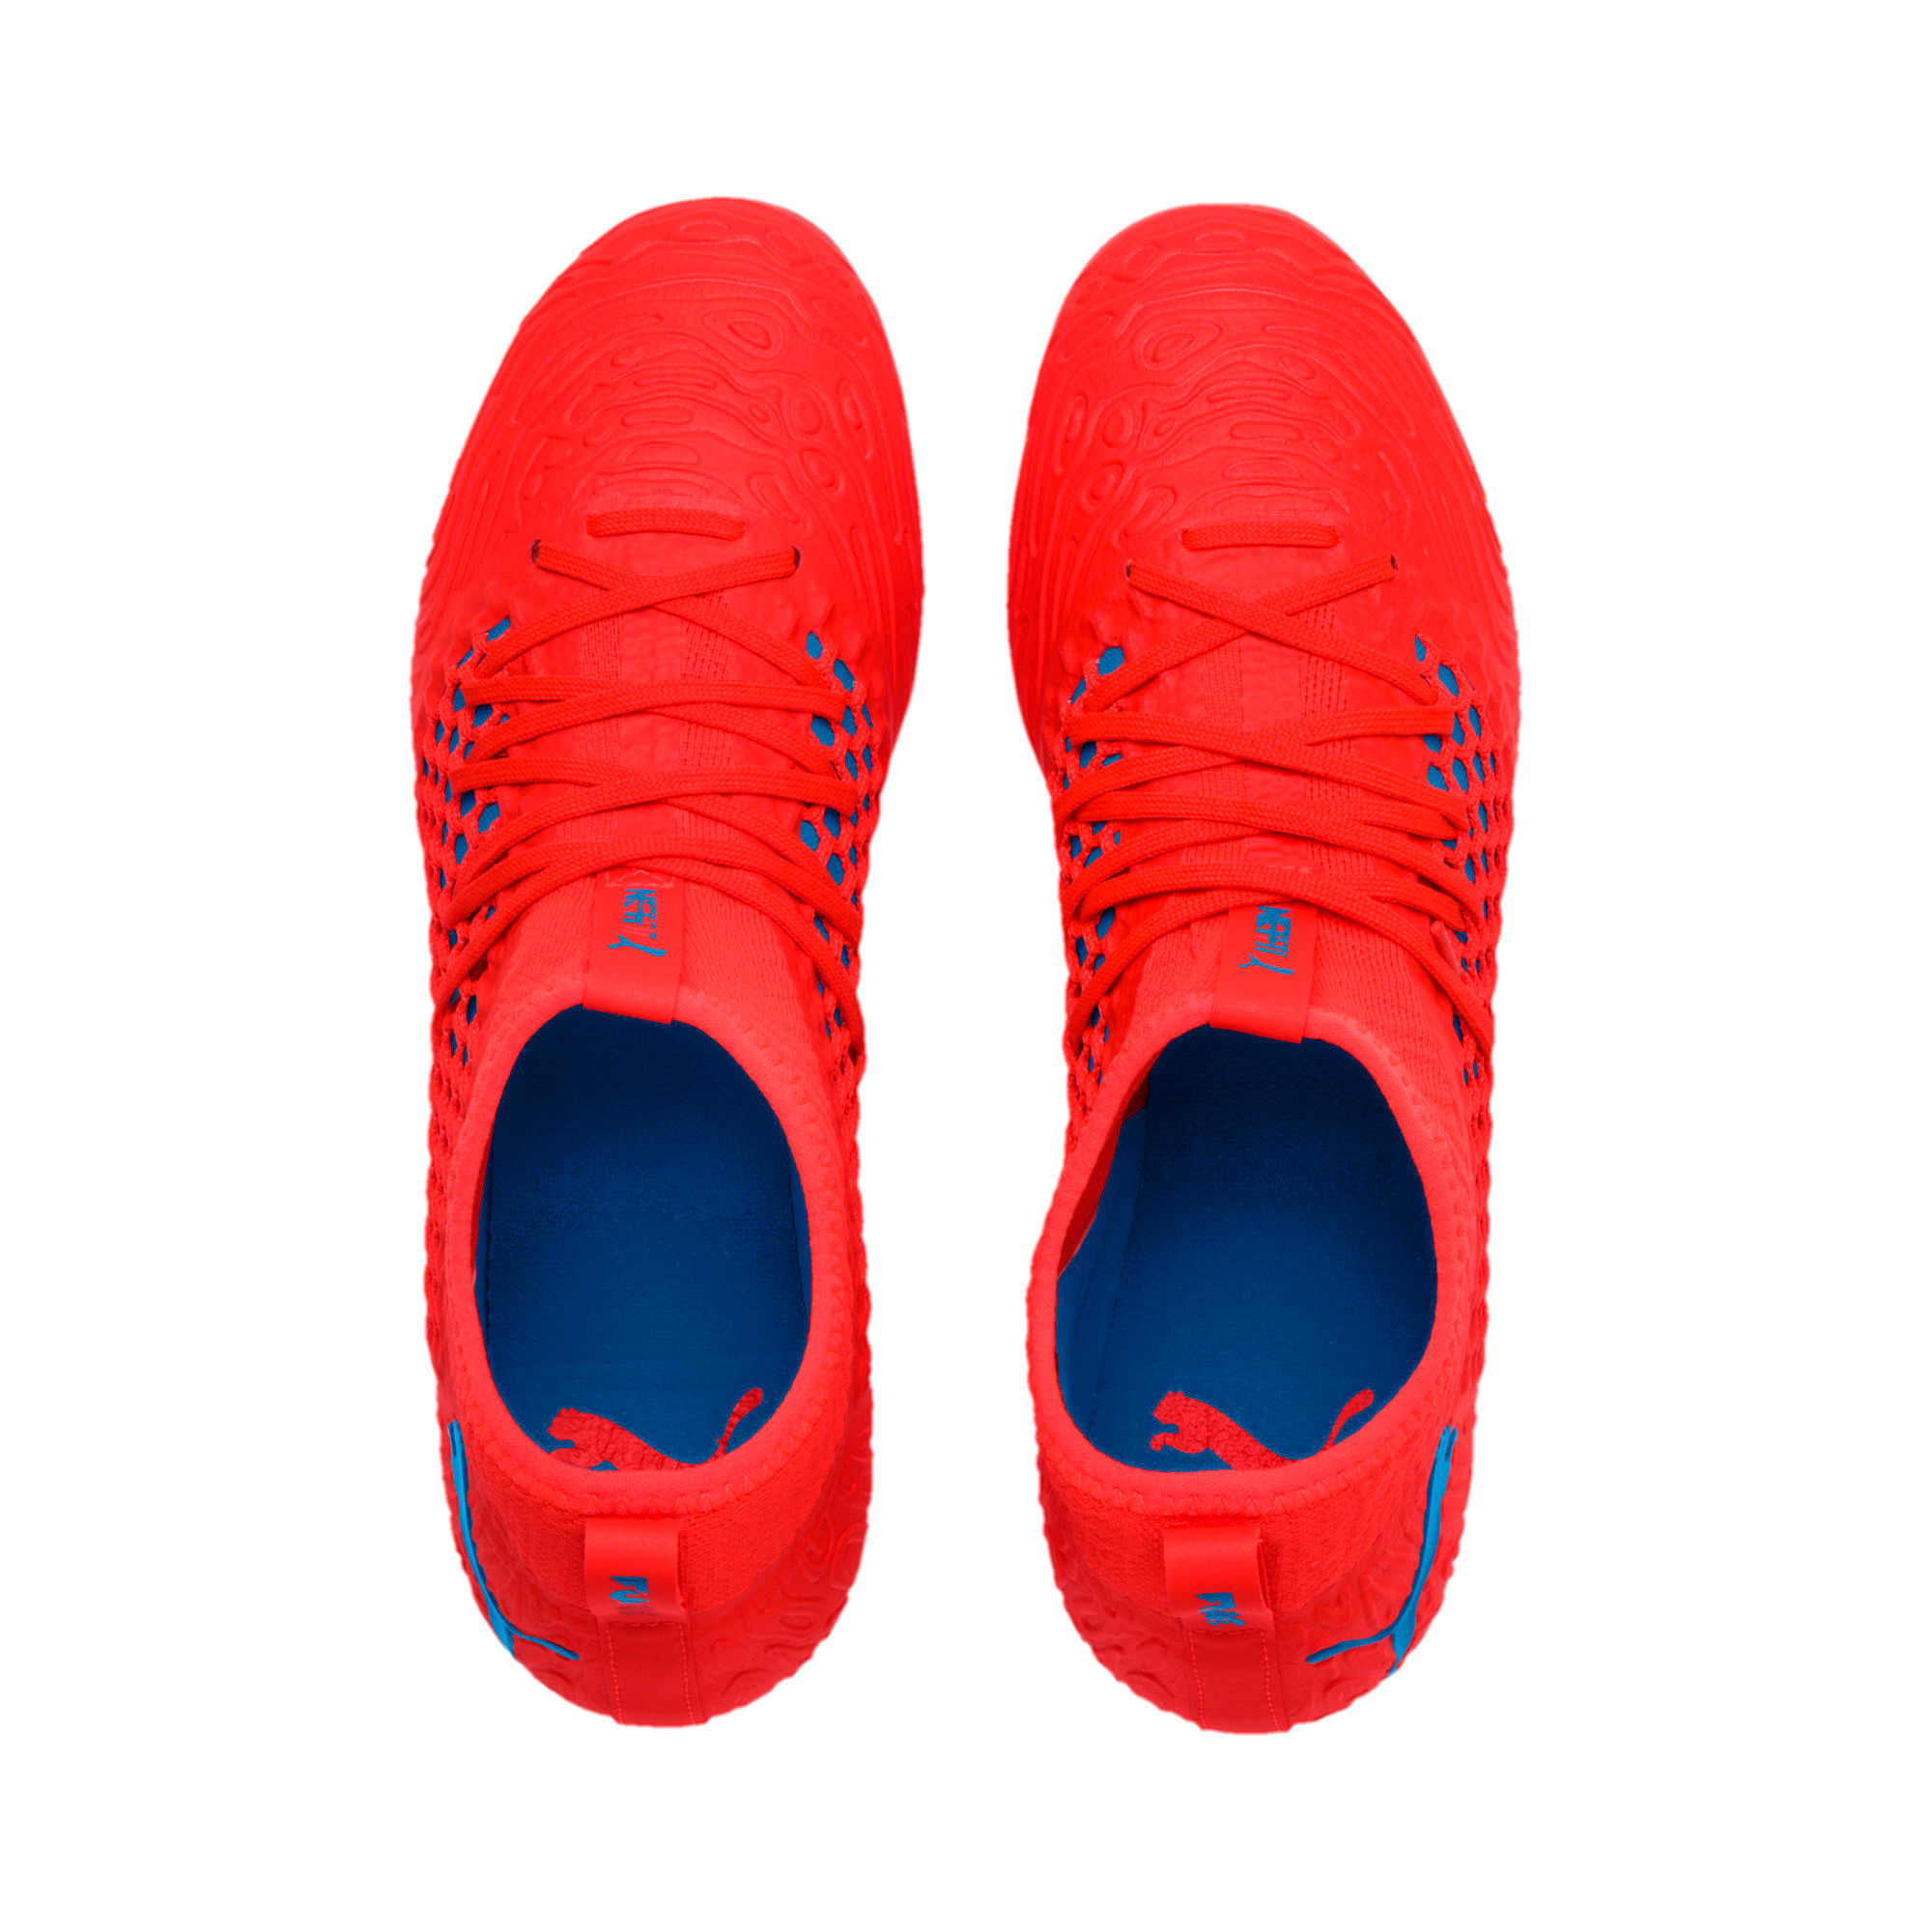 Thumbnail 6 of FUTURE 19.3 NETFIT FG/AG Men's Soccer Cleats, Red Blast-Bleu Azur, medium